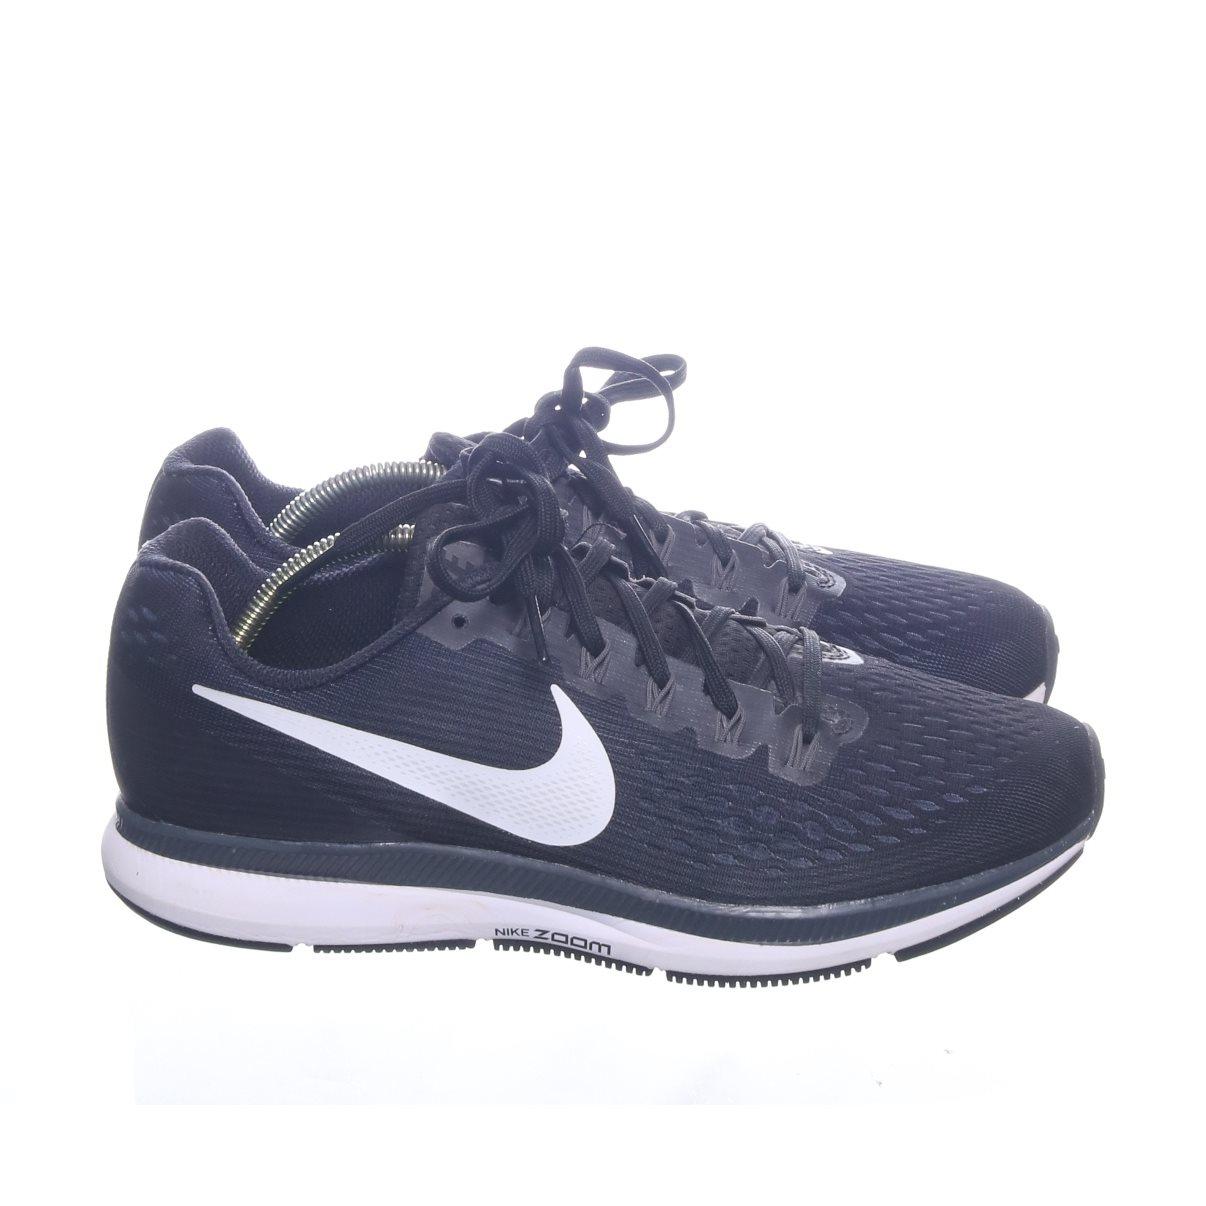 sports shoes 7e977 6478c Nike, Löparskor, Strl  39, Air Zoom Pegasus 34, Svart